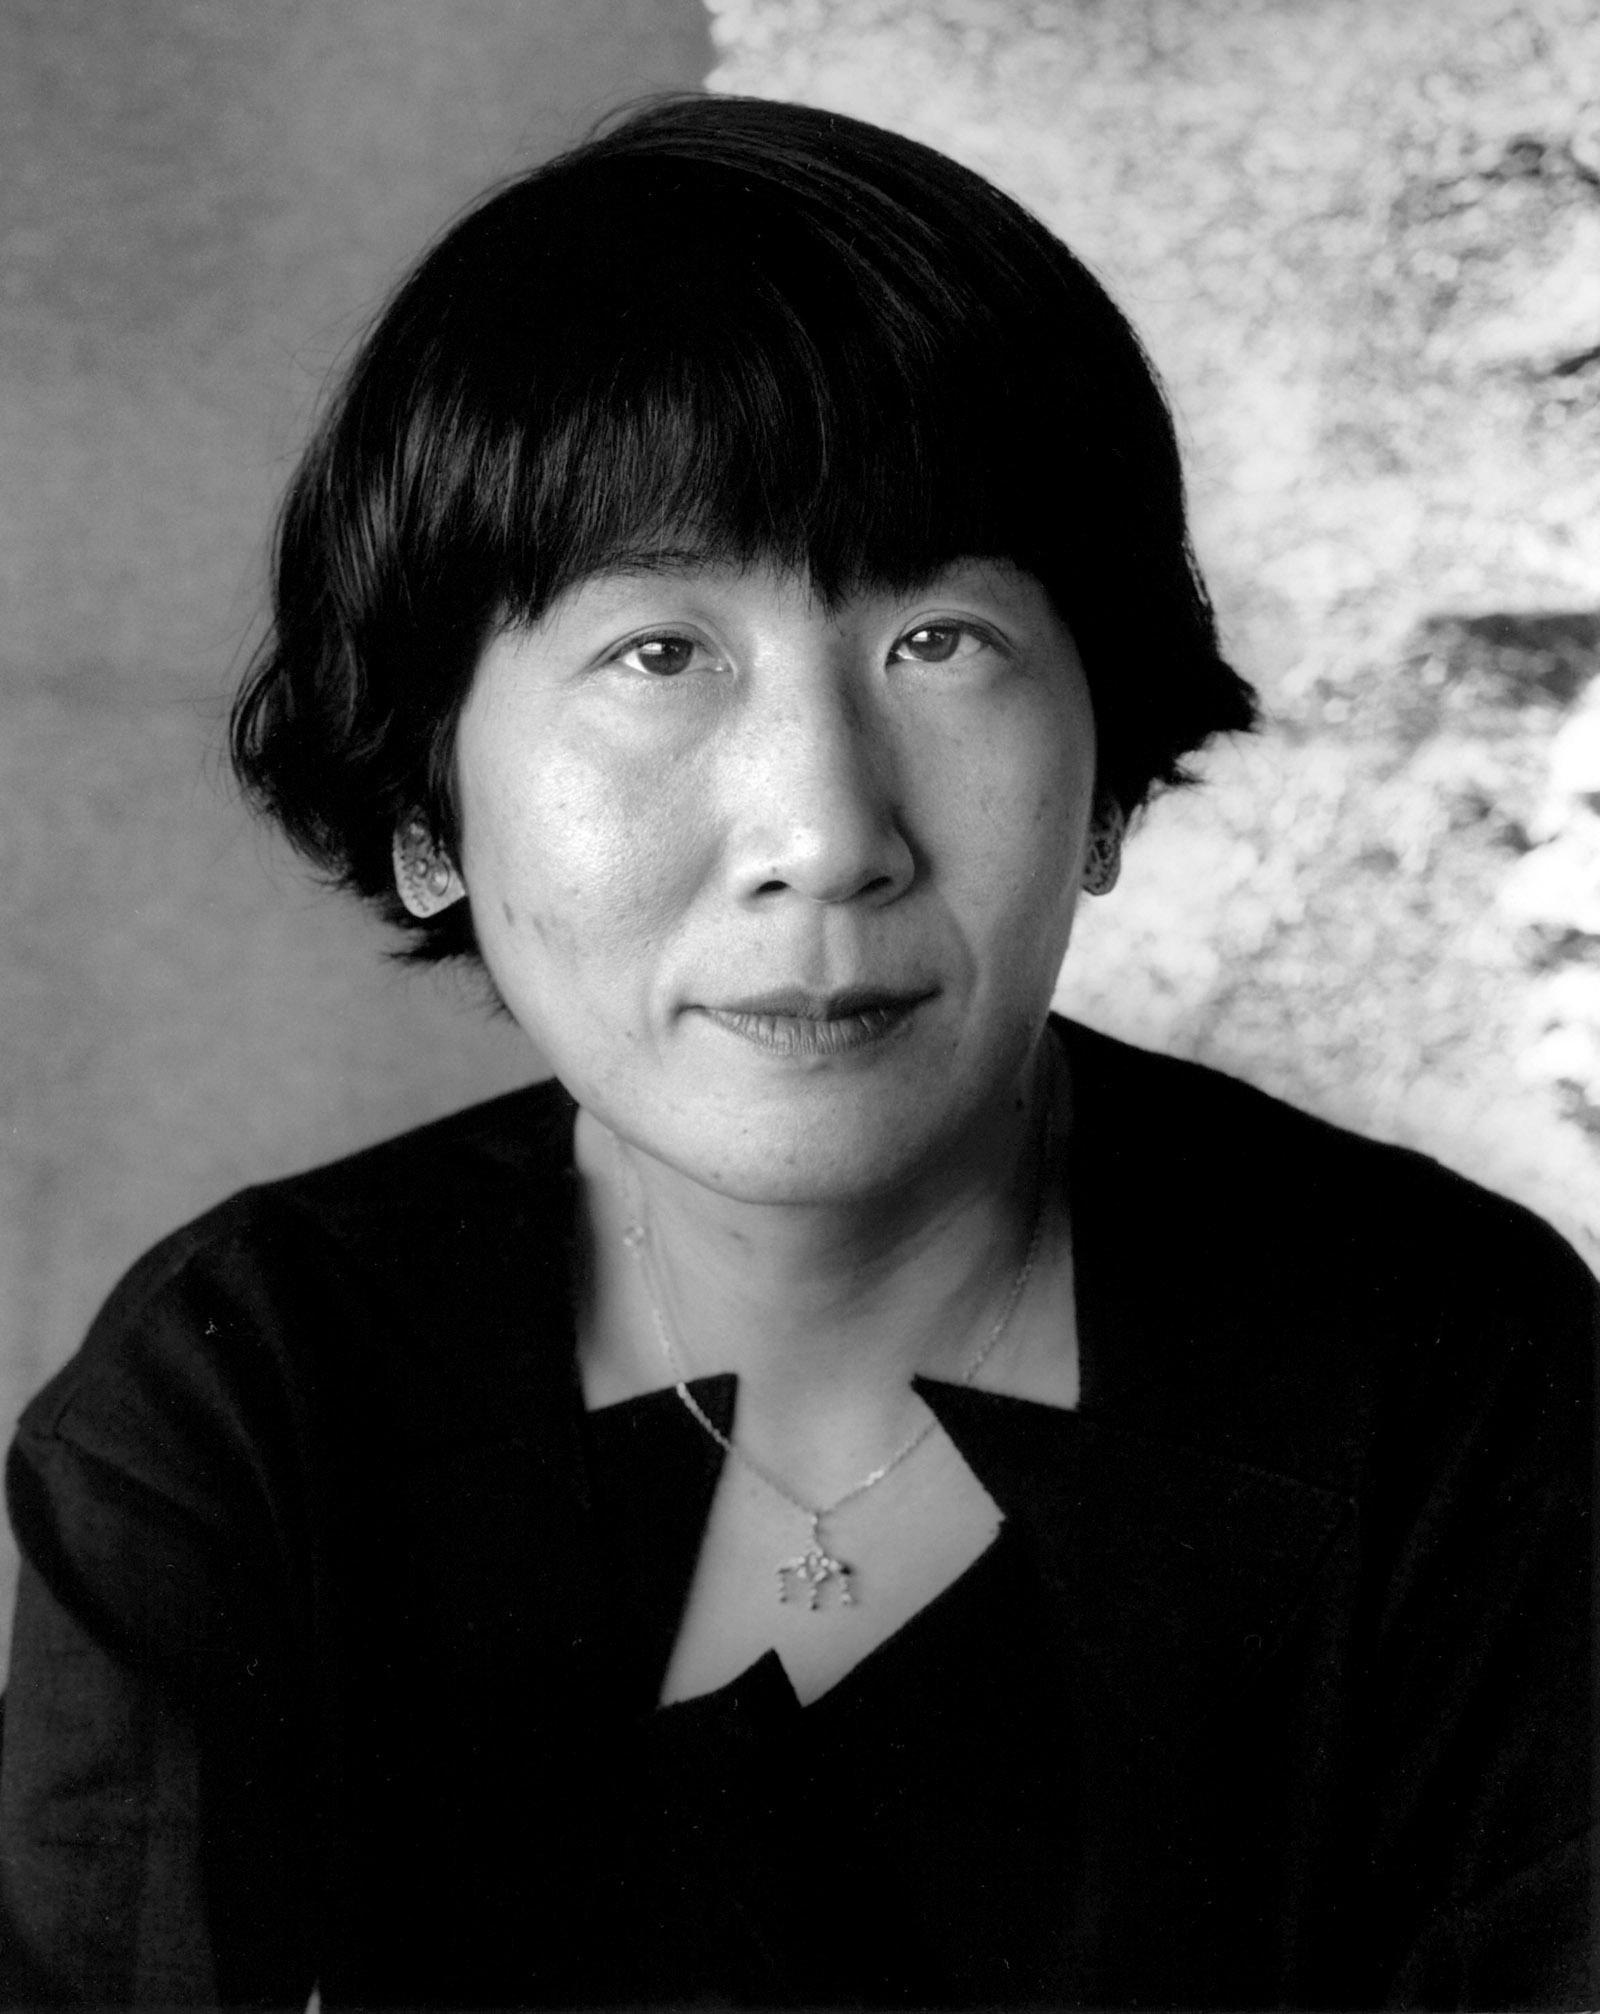 Yuko Tsushima, St. Malo, France, 1995